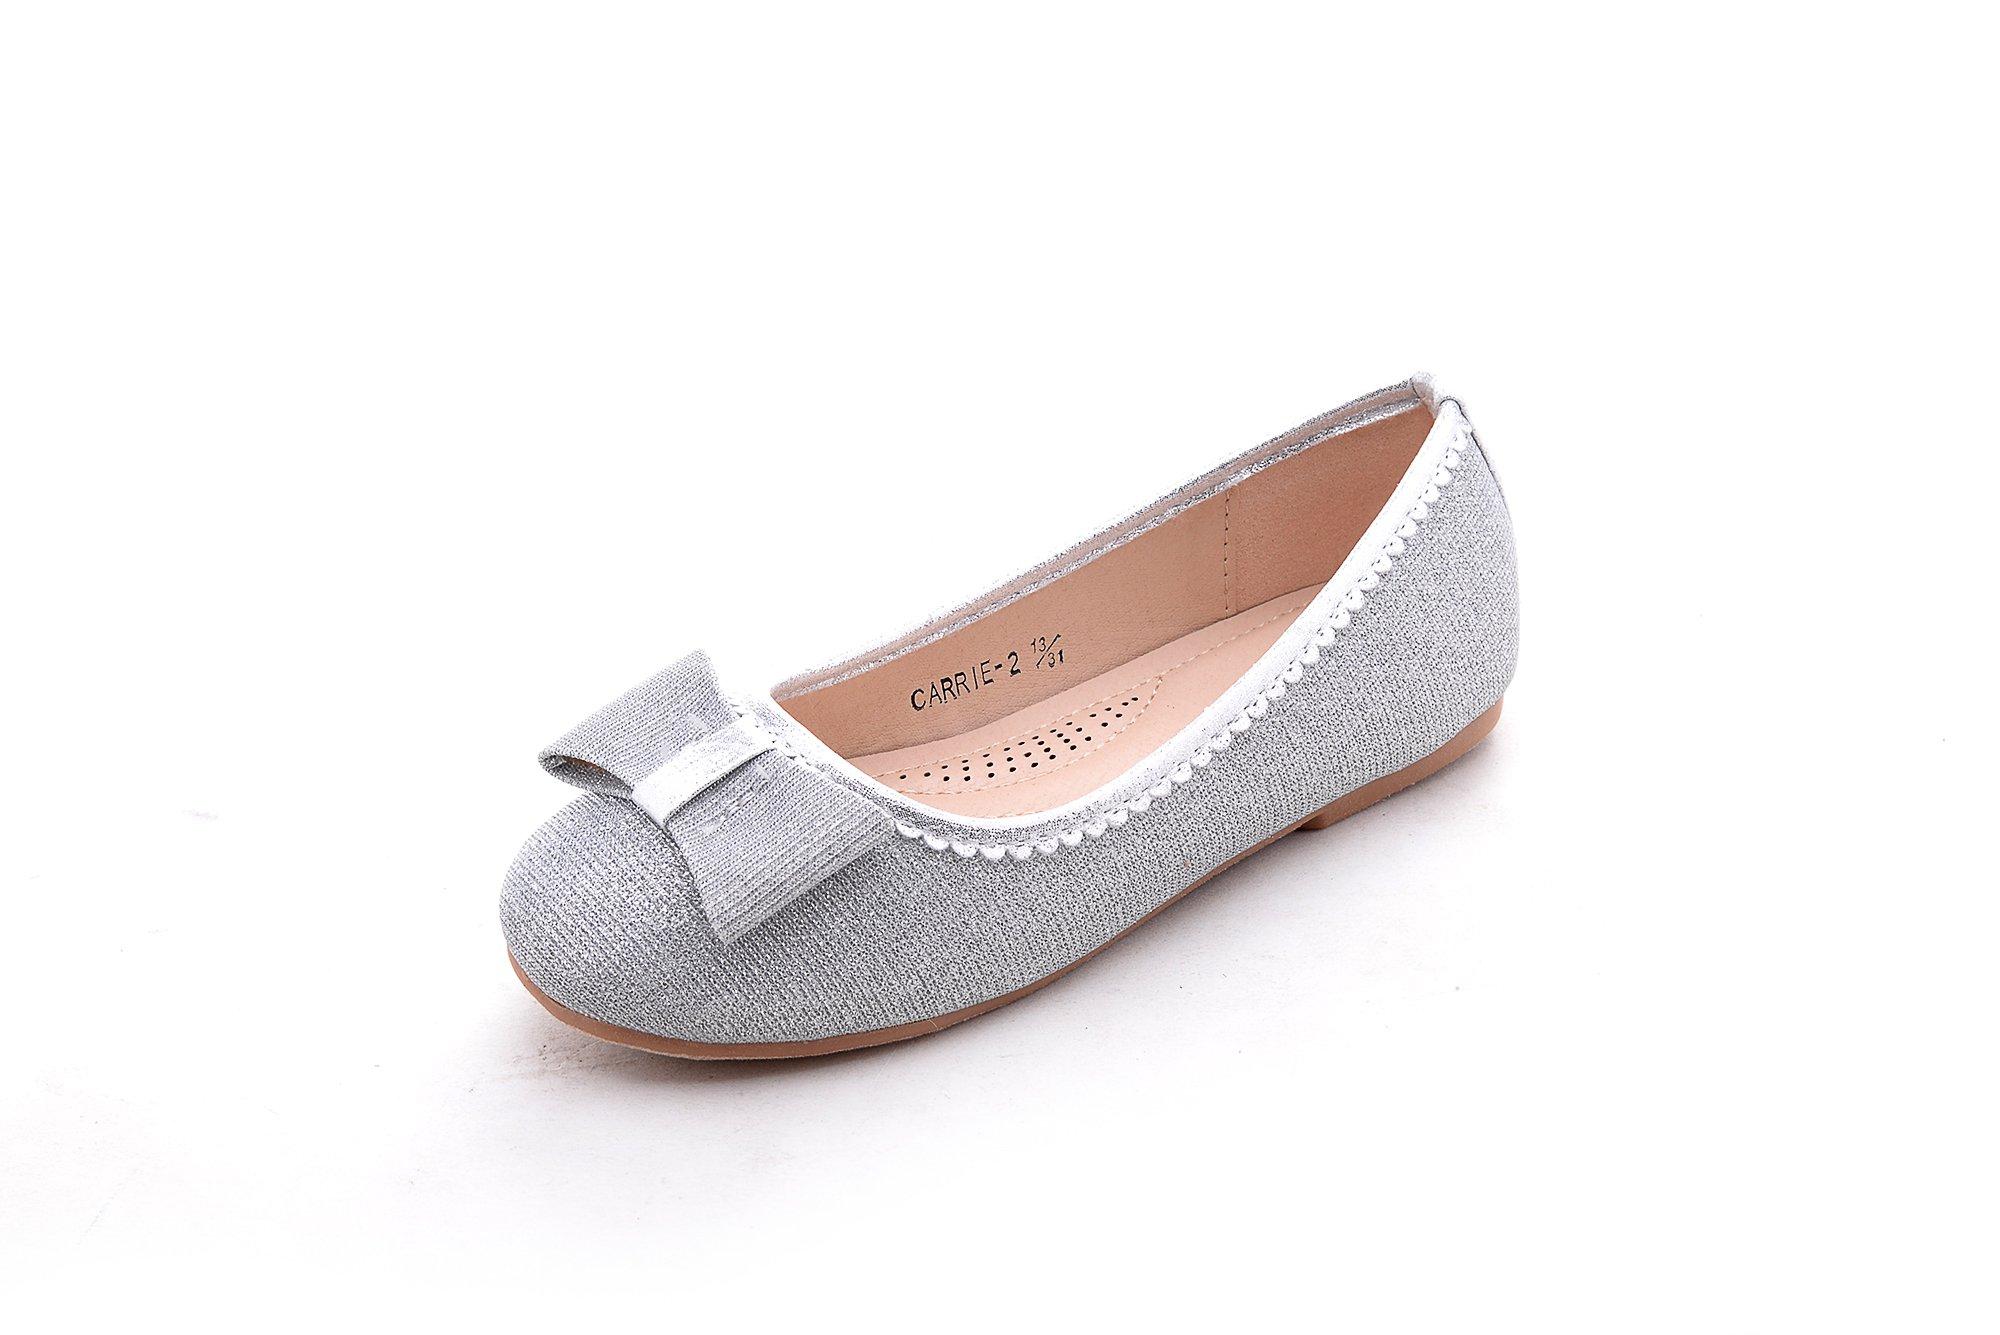 Mila Girls Casual Comfortable Slip On Glitter Ballet Flat Dress Shoes for Girl Wedding Party, Carrie-2 Sliver 2